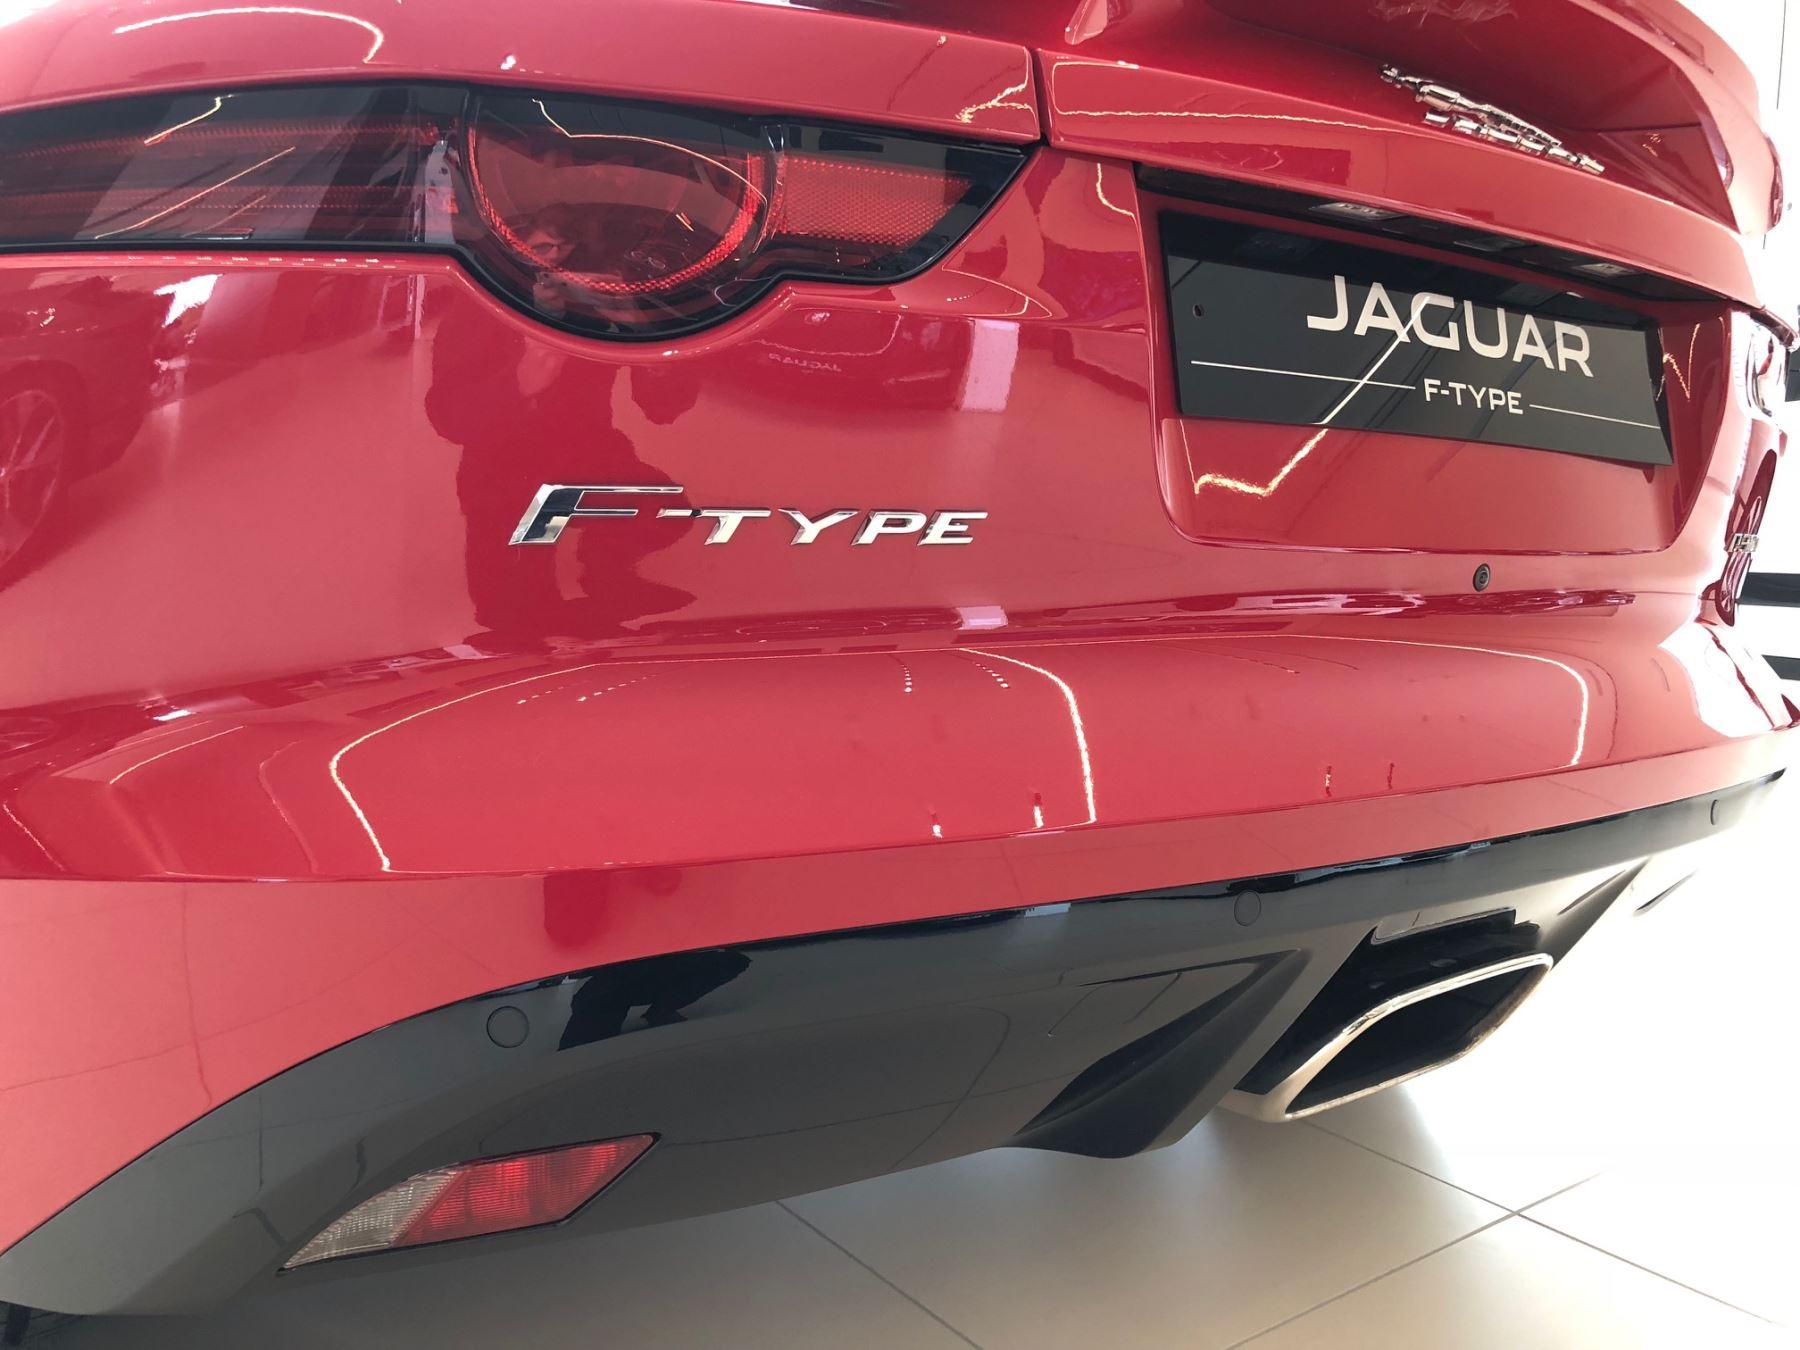 Jaguar F-TYPE 2.0 300PS RWD R-Dynamic image 8